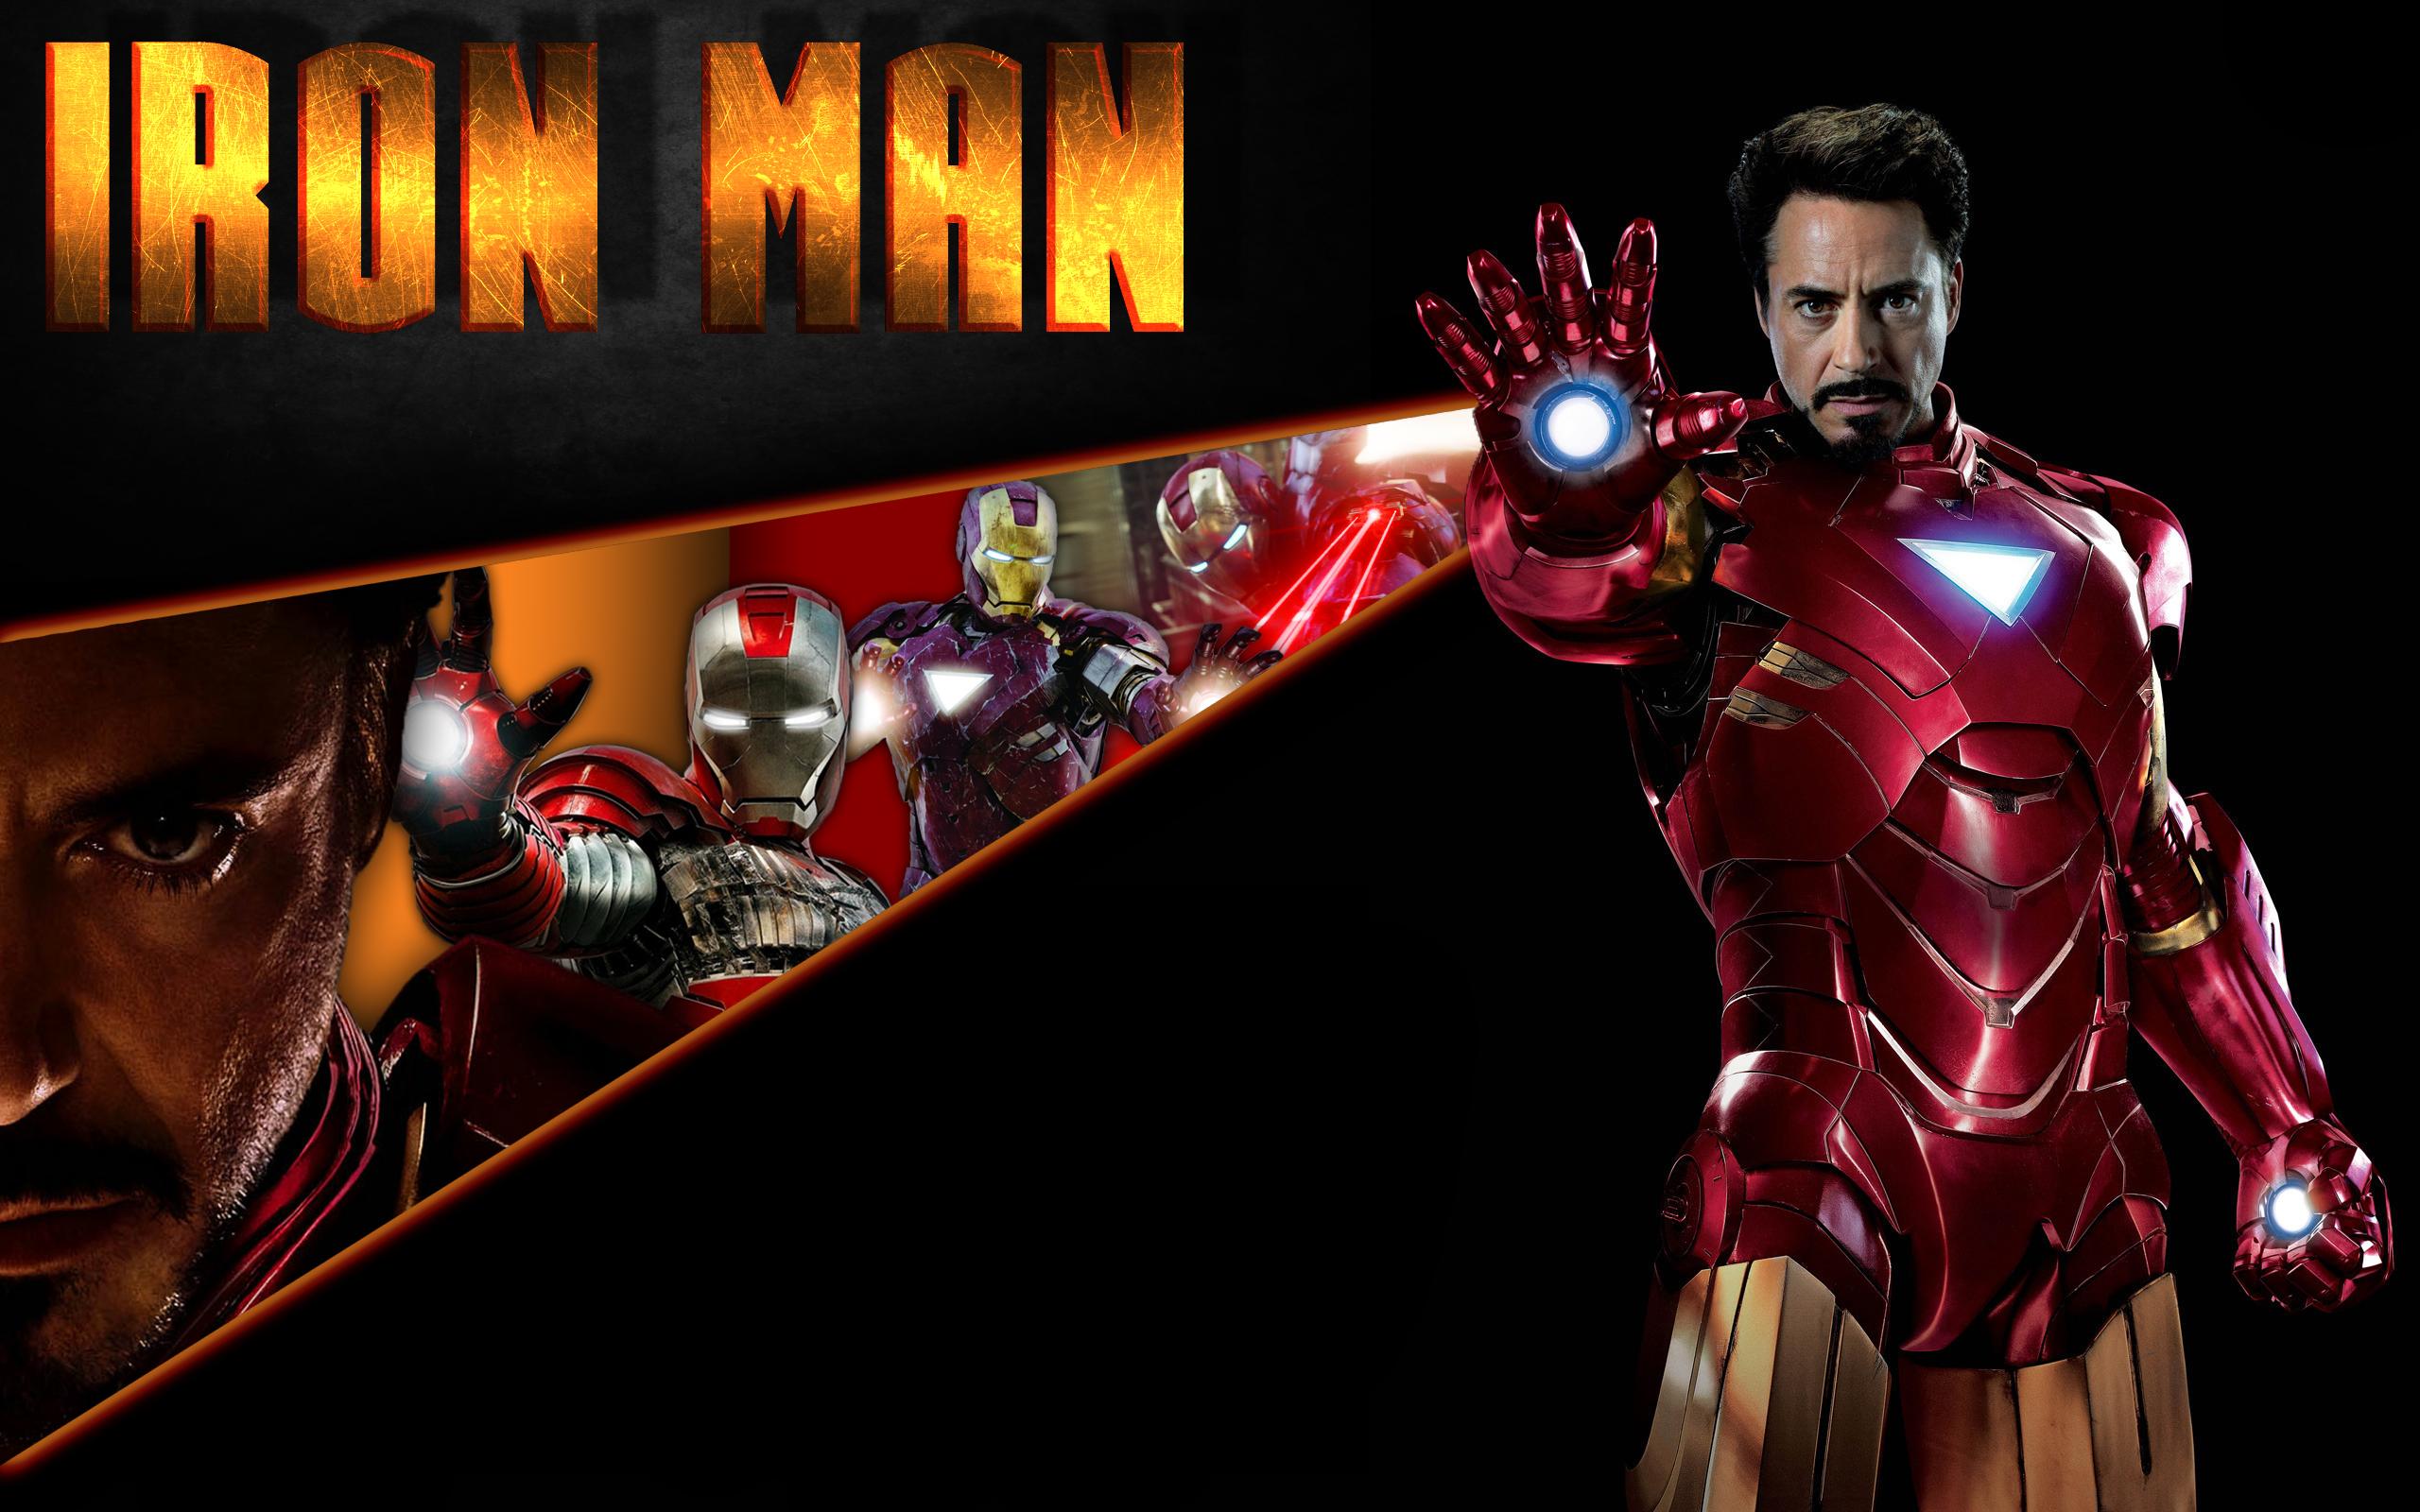 Iron man wallpaper by Nick004